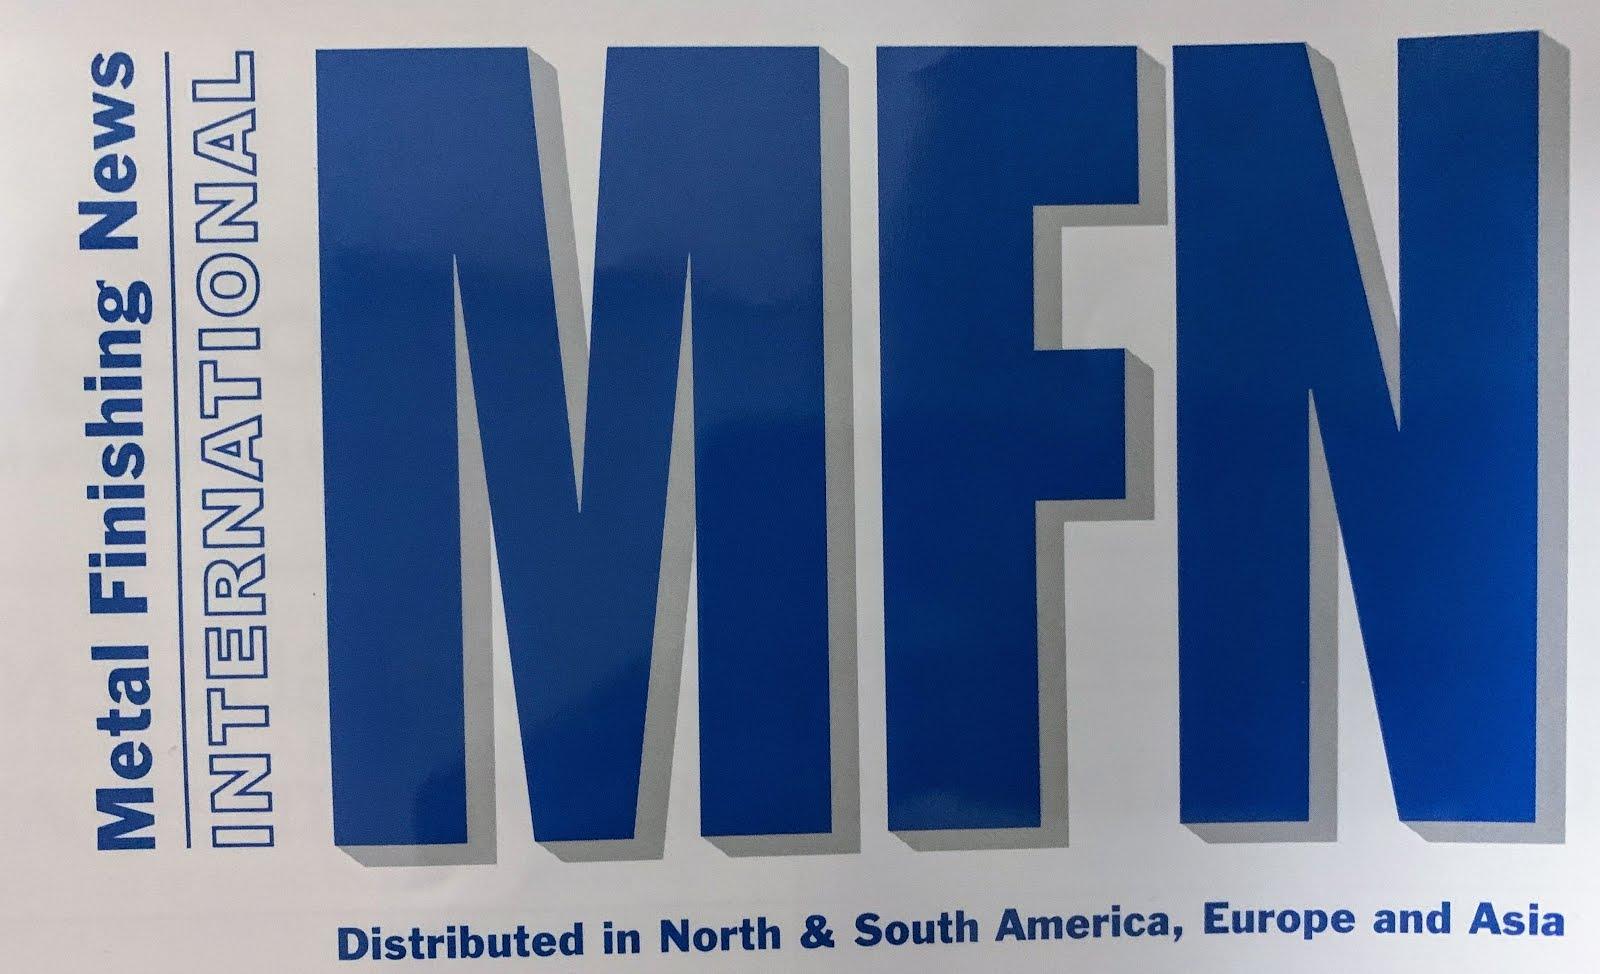 MFN Metal Finshing News